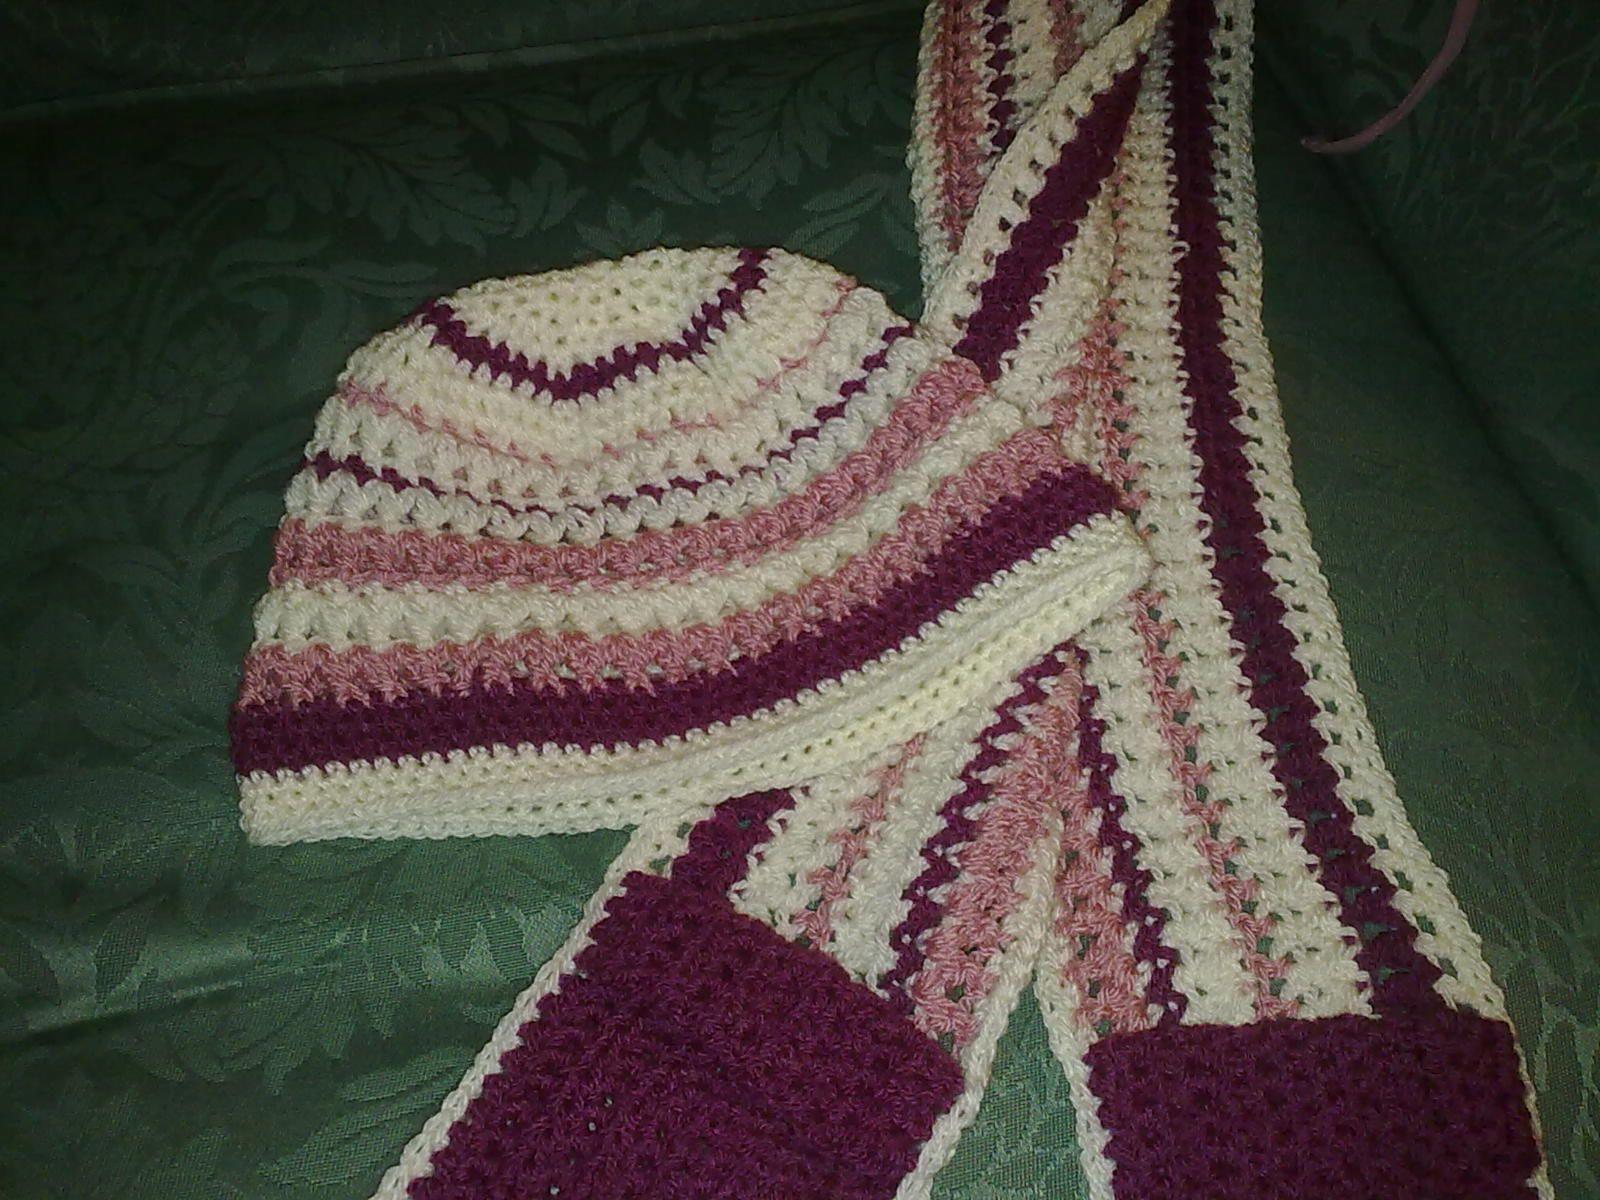 Crochet hat and scarf set crochet hats pinterest